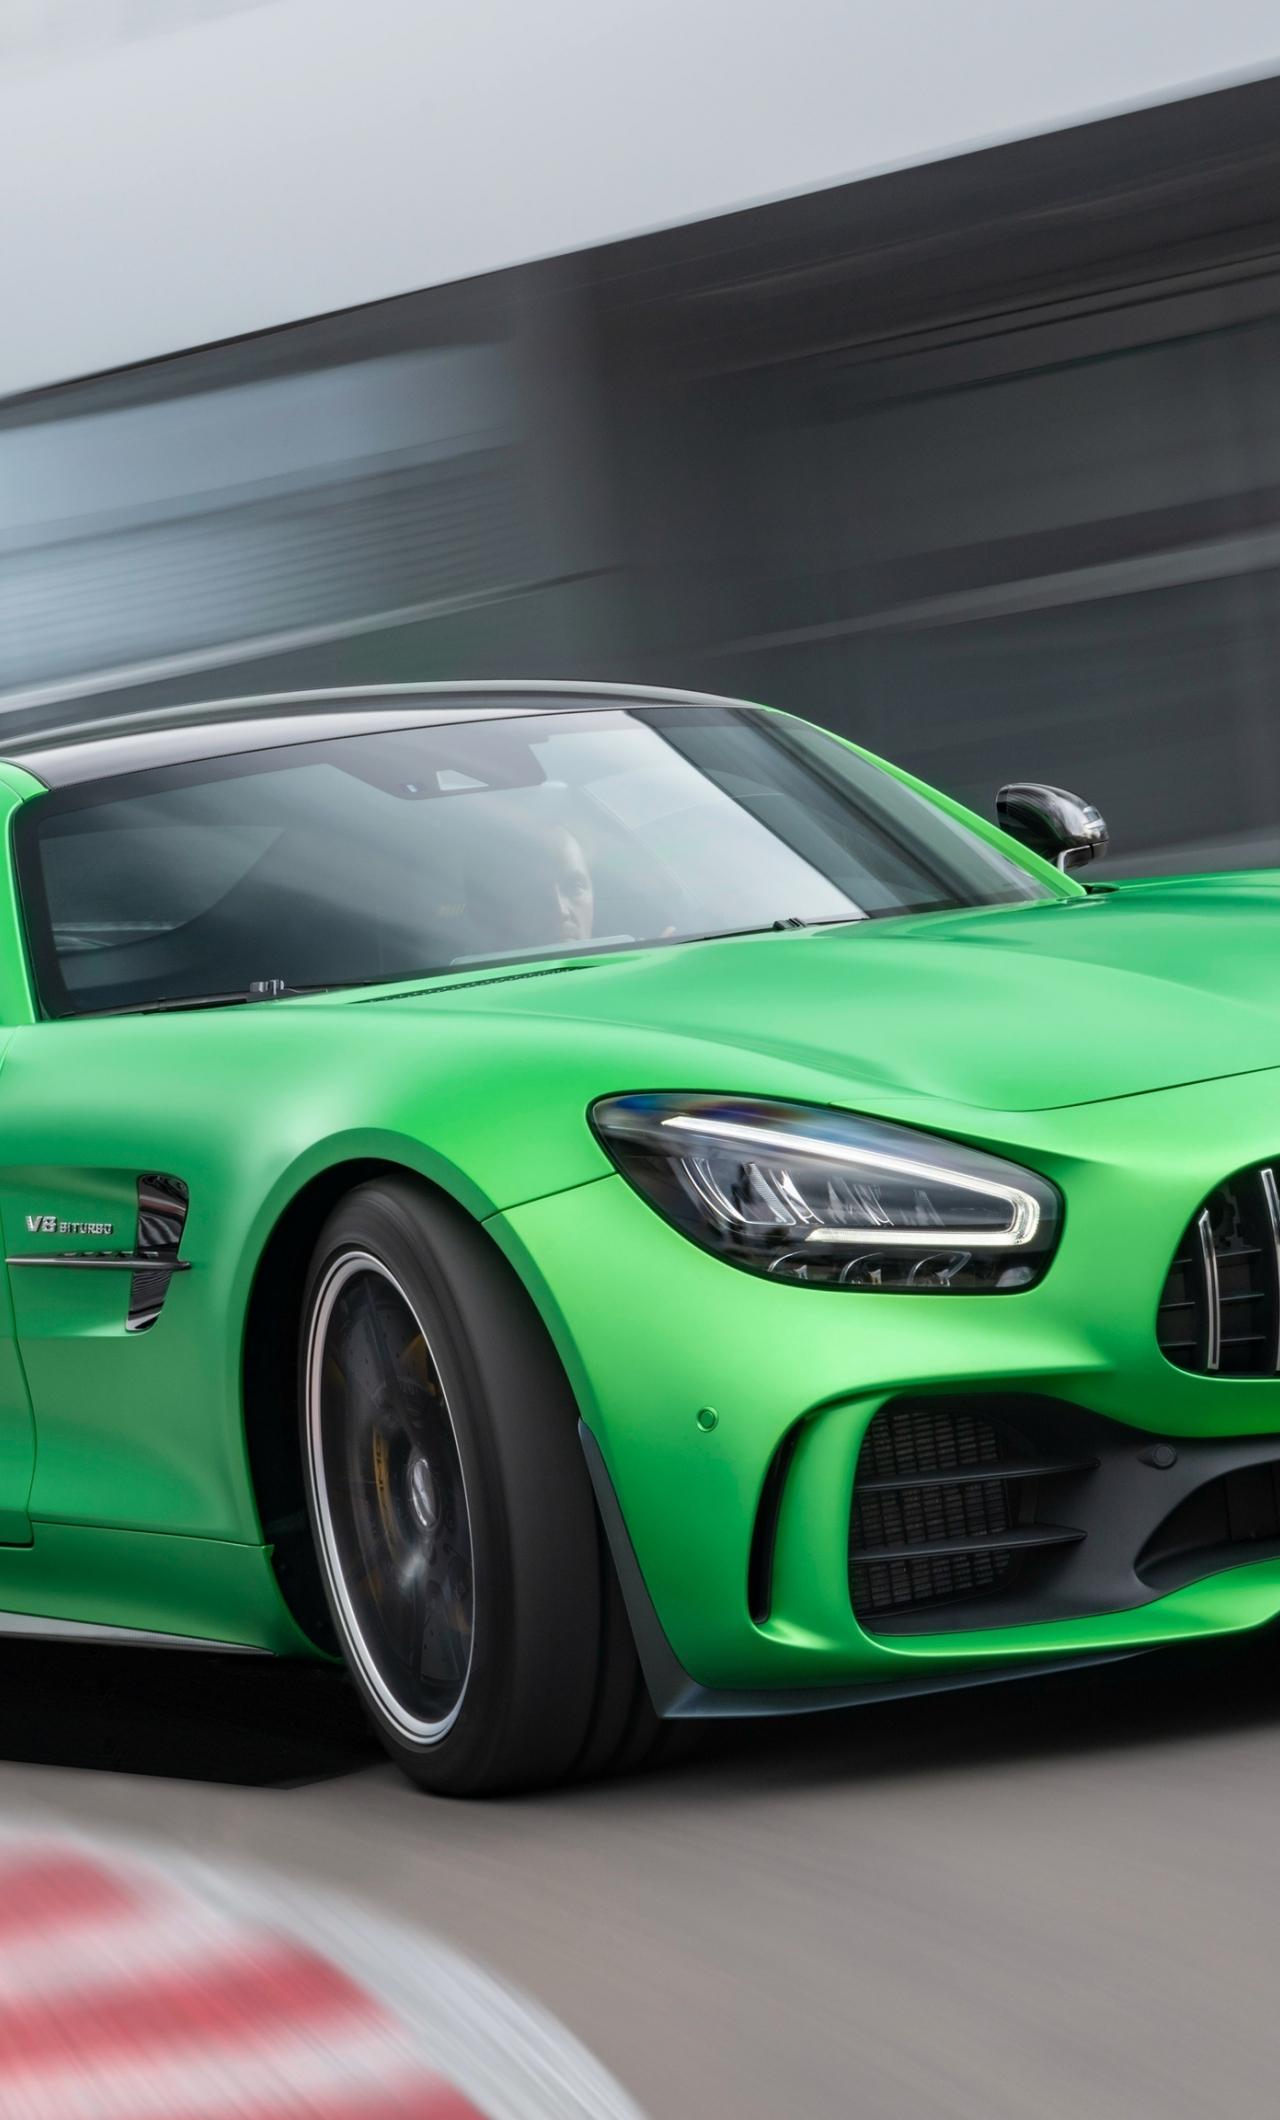 Mercedes-AMG GT, green car, on-road, 1280x2120 wallpaper